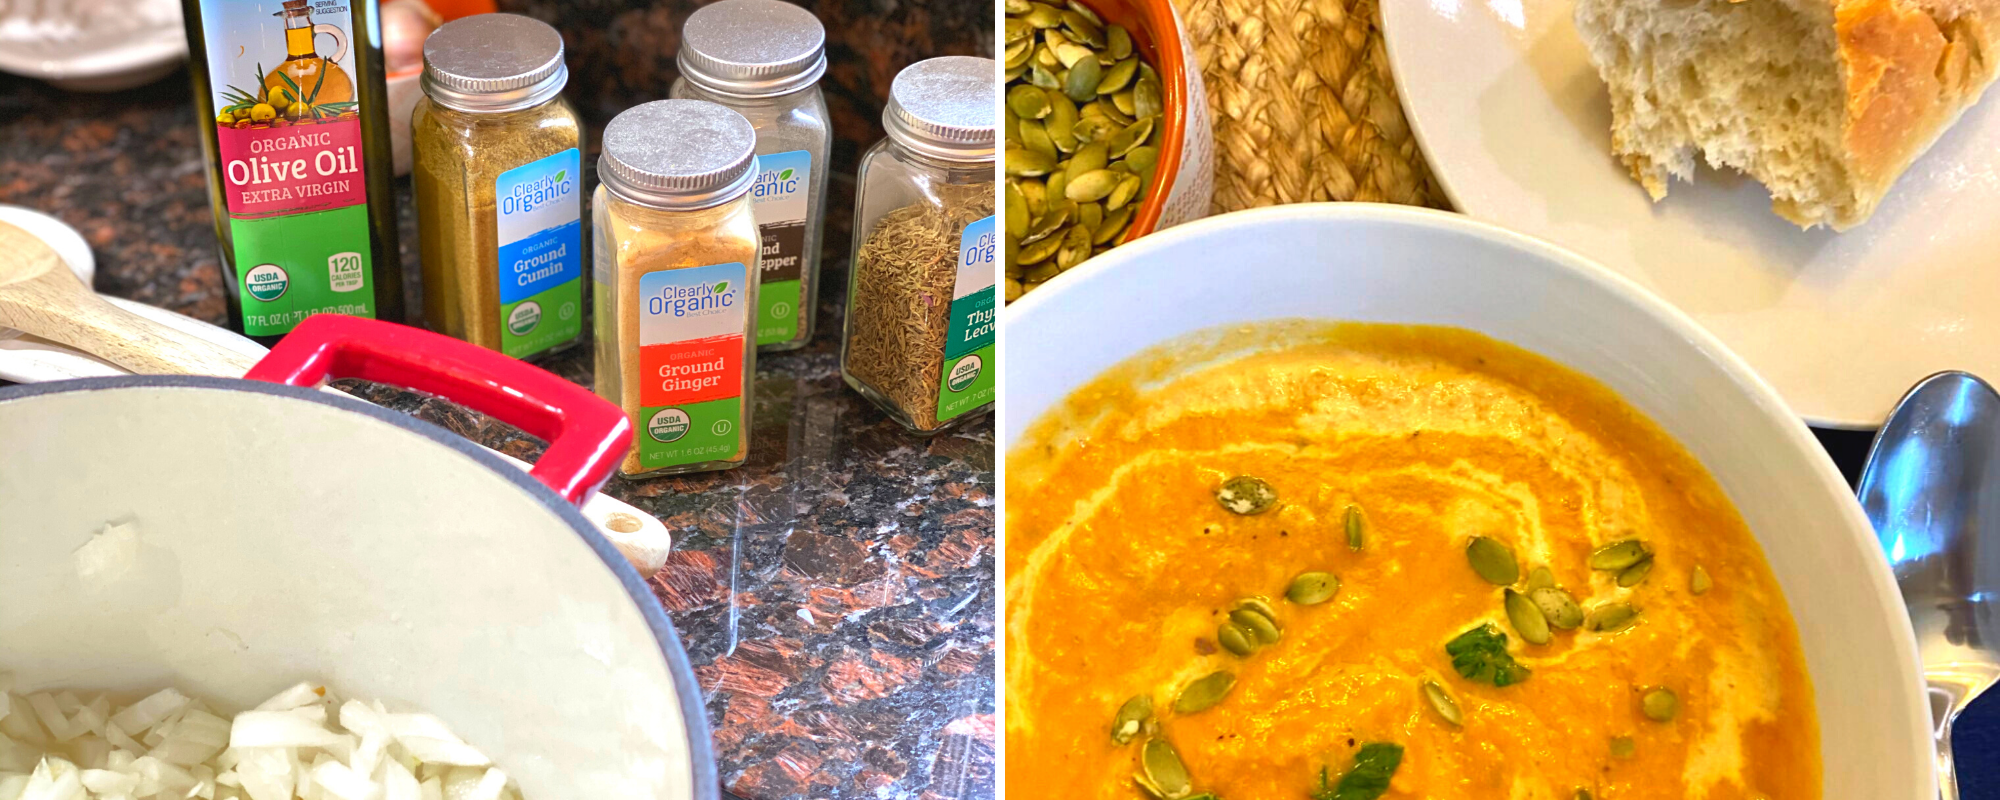 Easy Homemade Pumpkin Soup